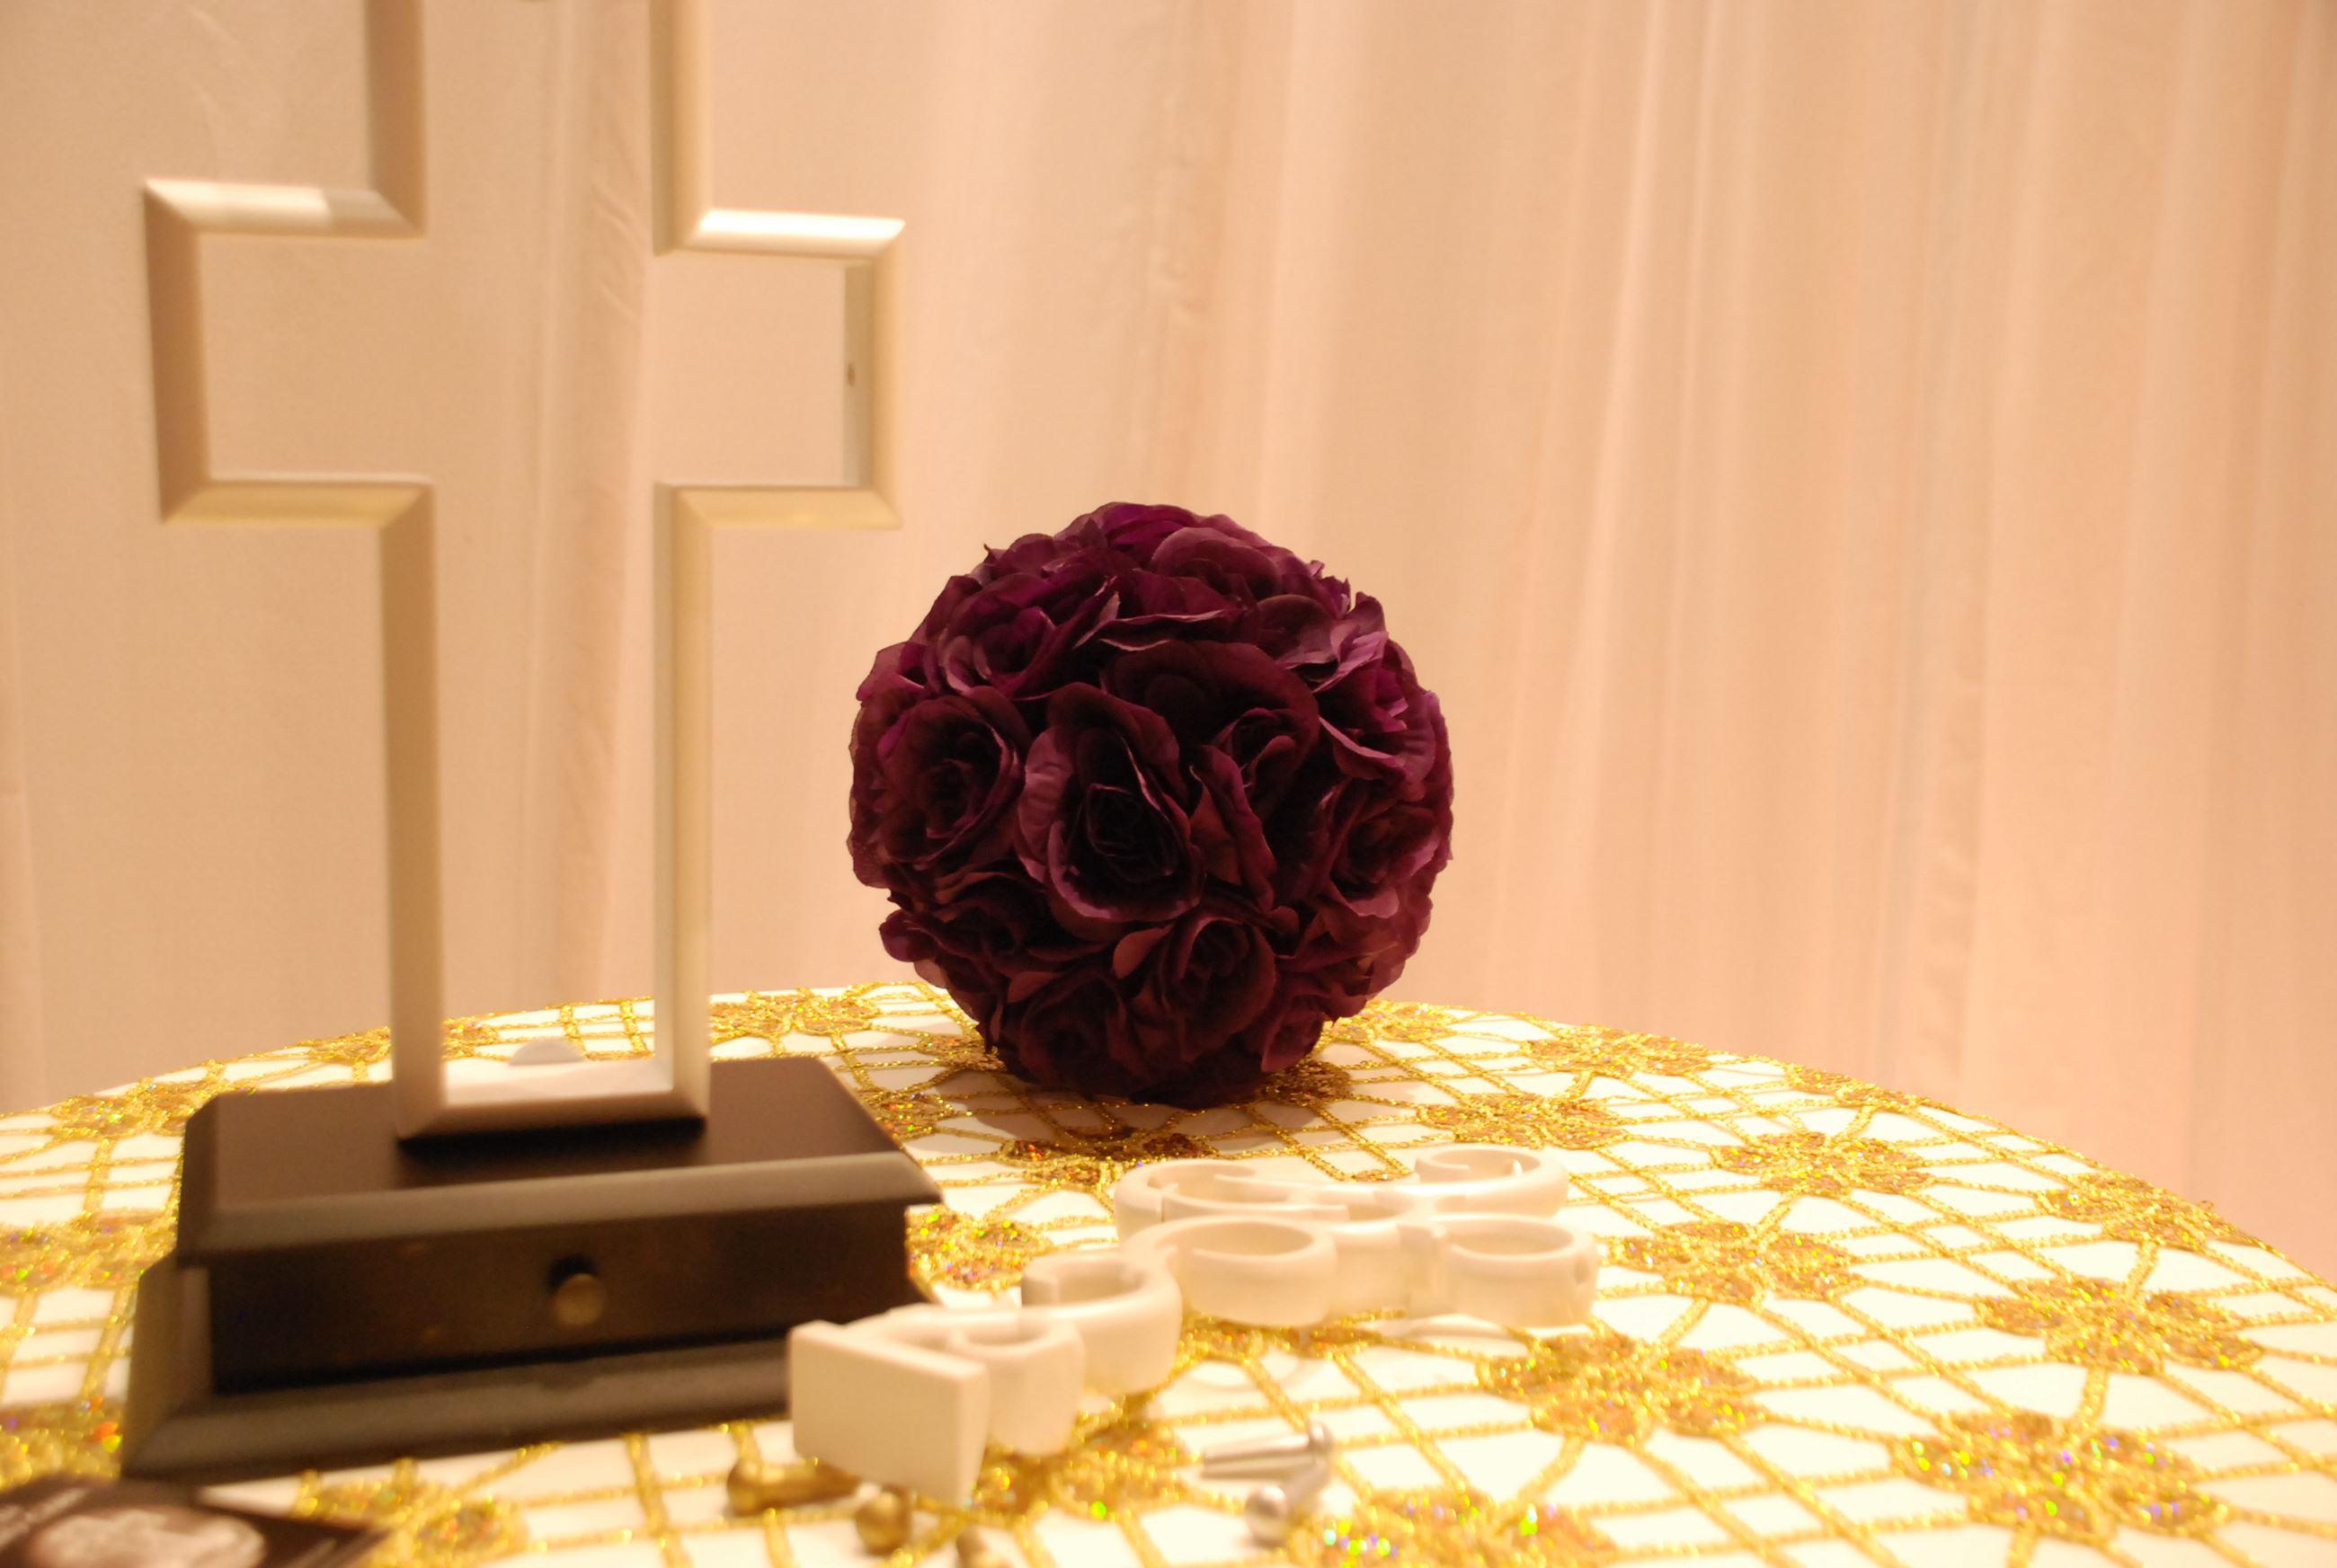 Weddings | Mesquite, TX - Official Website